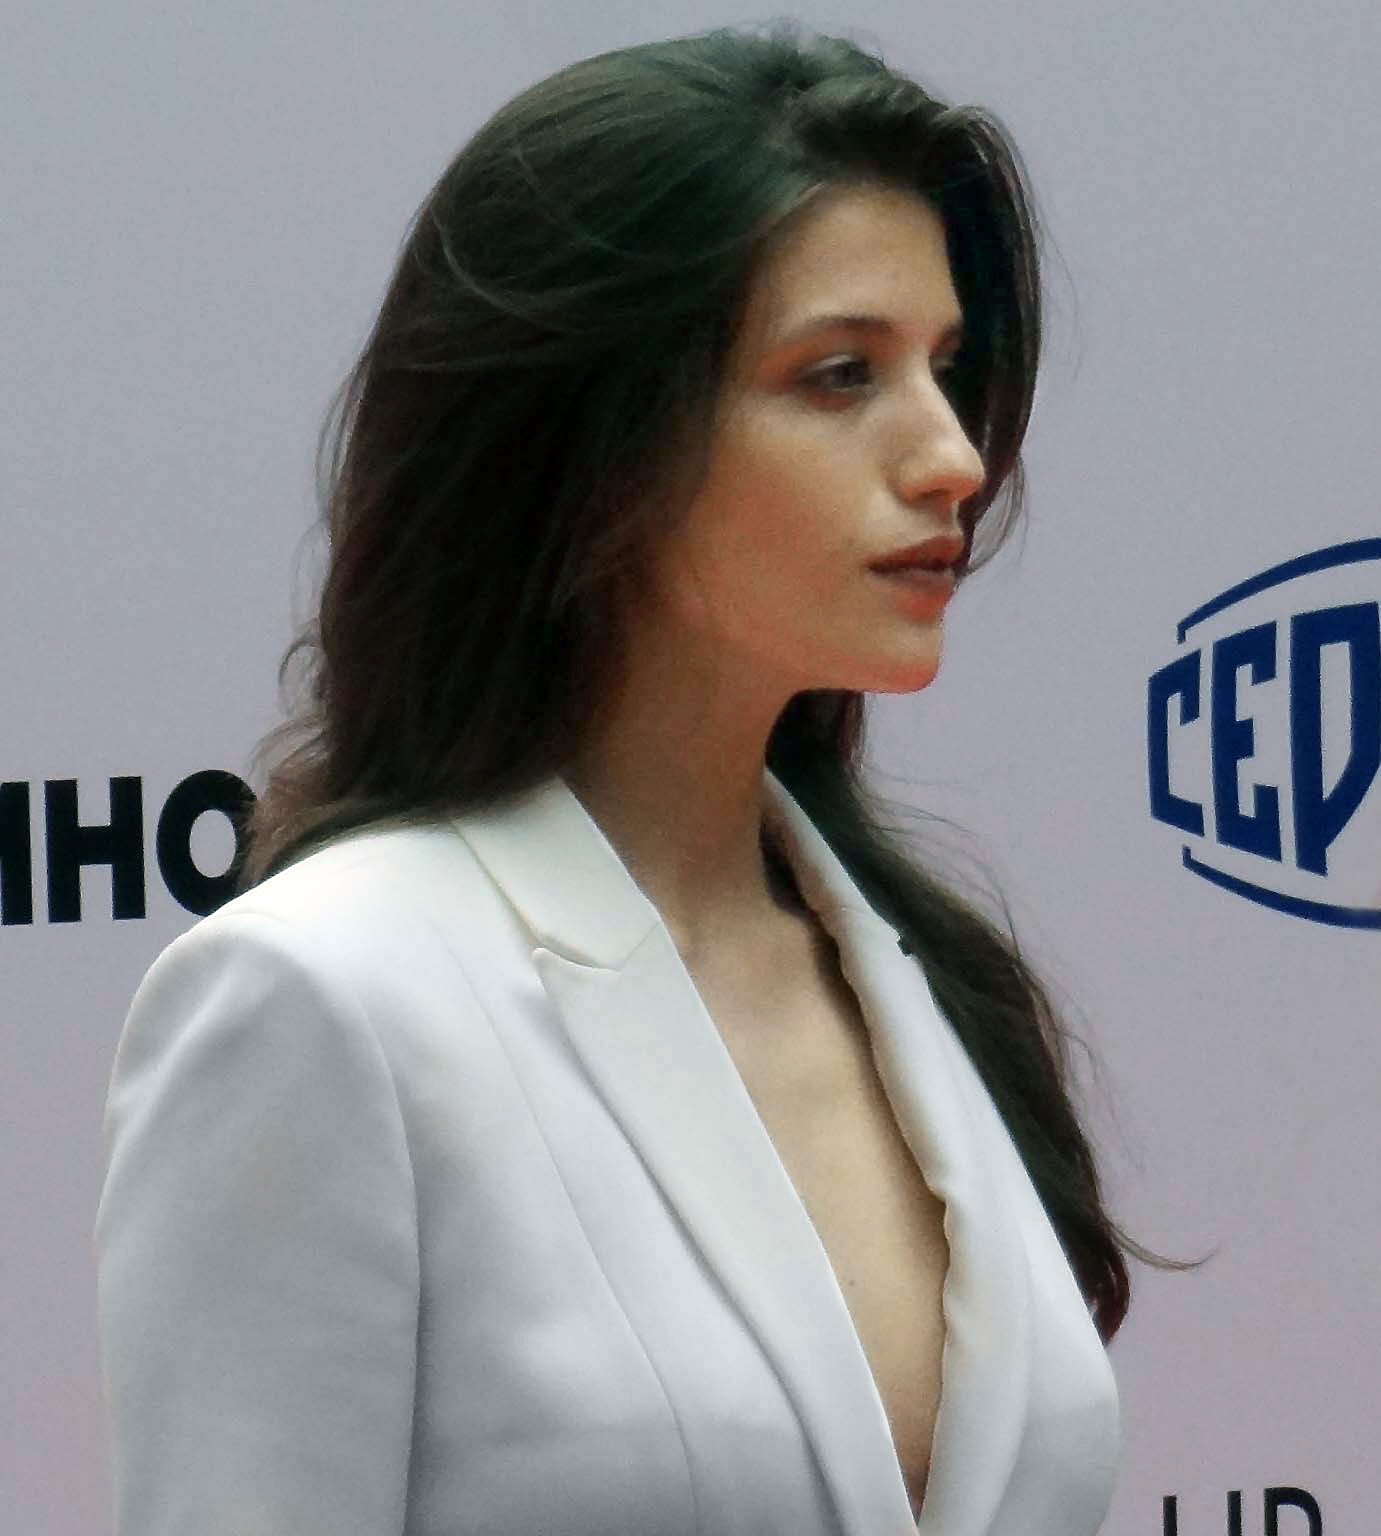 Fotos Anna Chipovskaya naked (19 photo), Tits, Leaked, Instagram, legs 2006